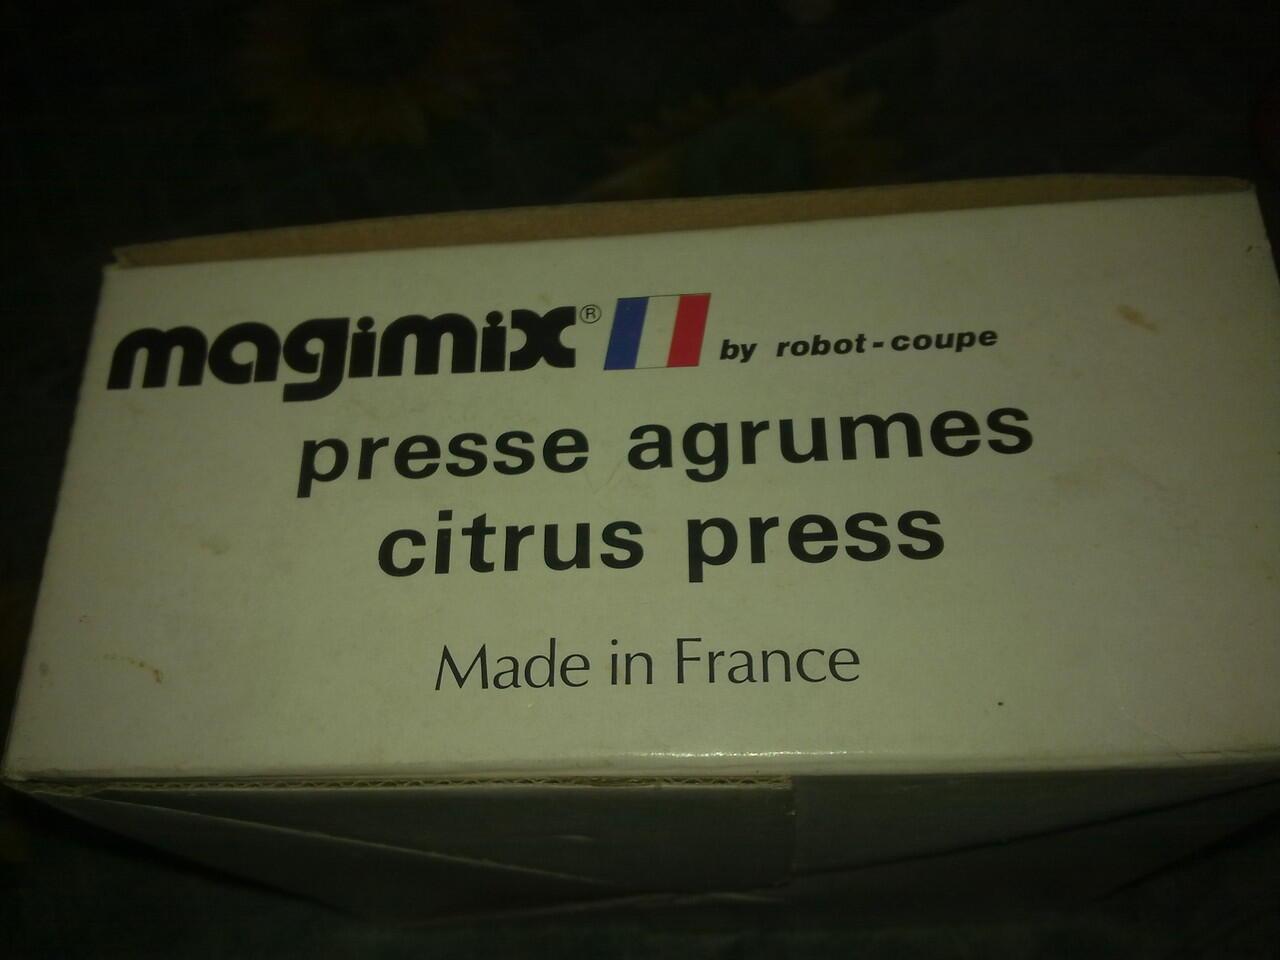 magimix citrus press antik made in france